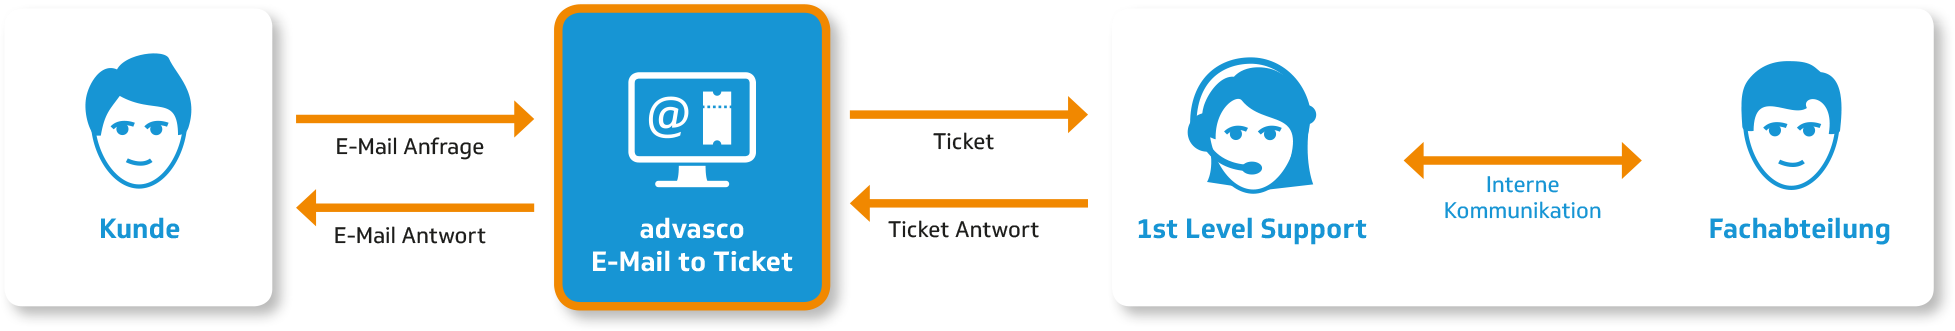 E-Mail to Ticket | advasco IT-Lösung